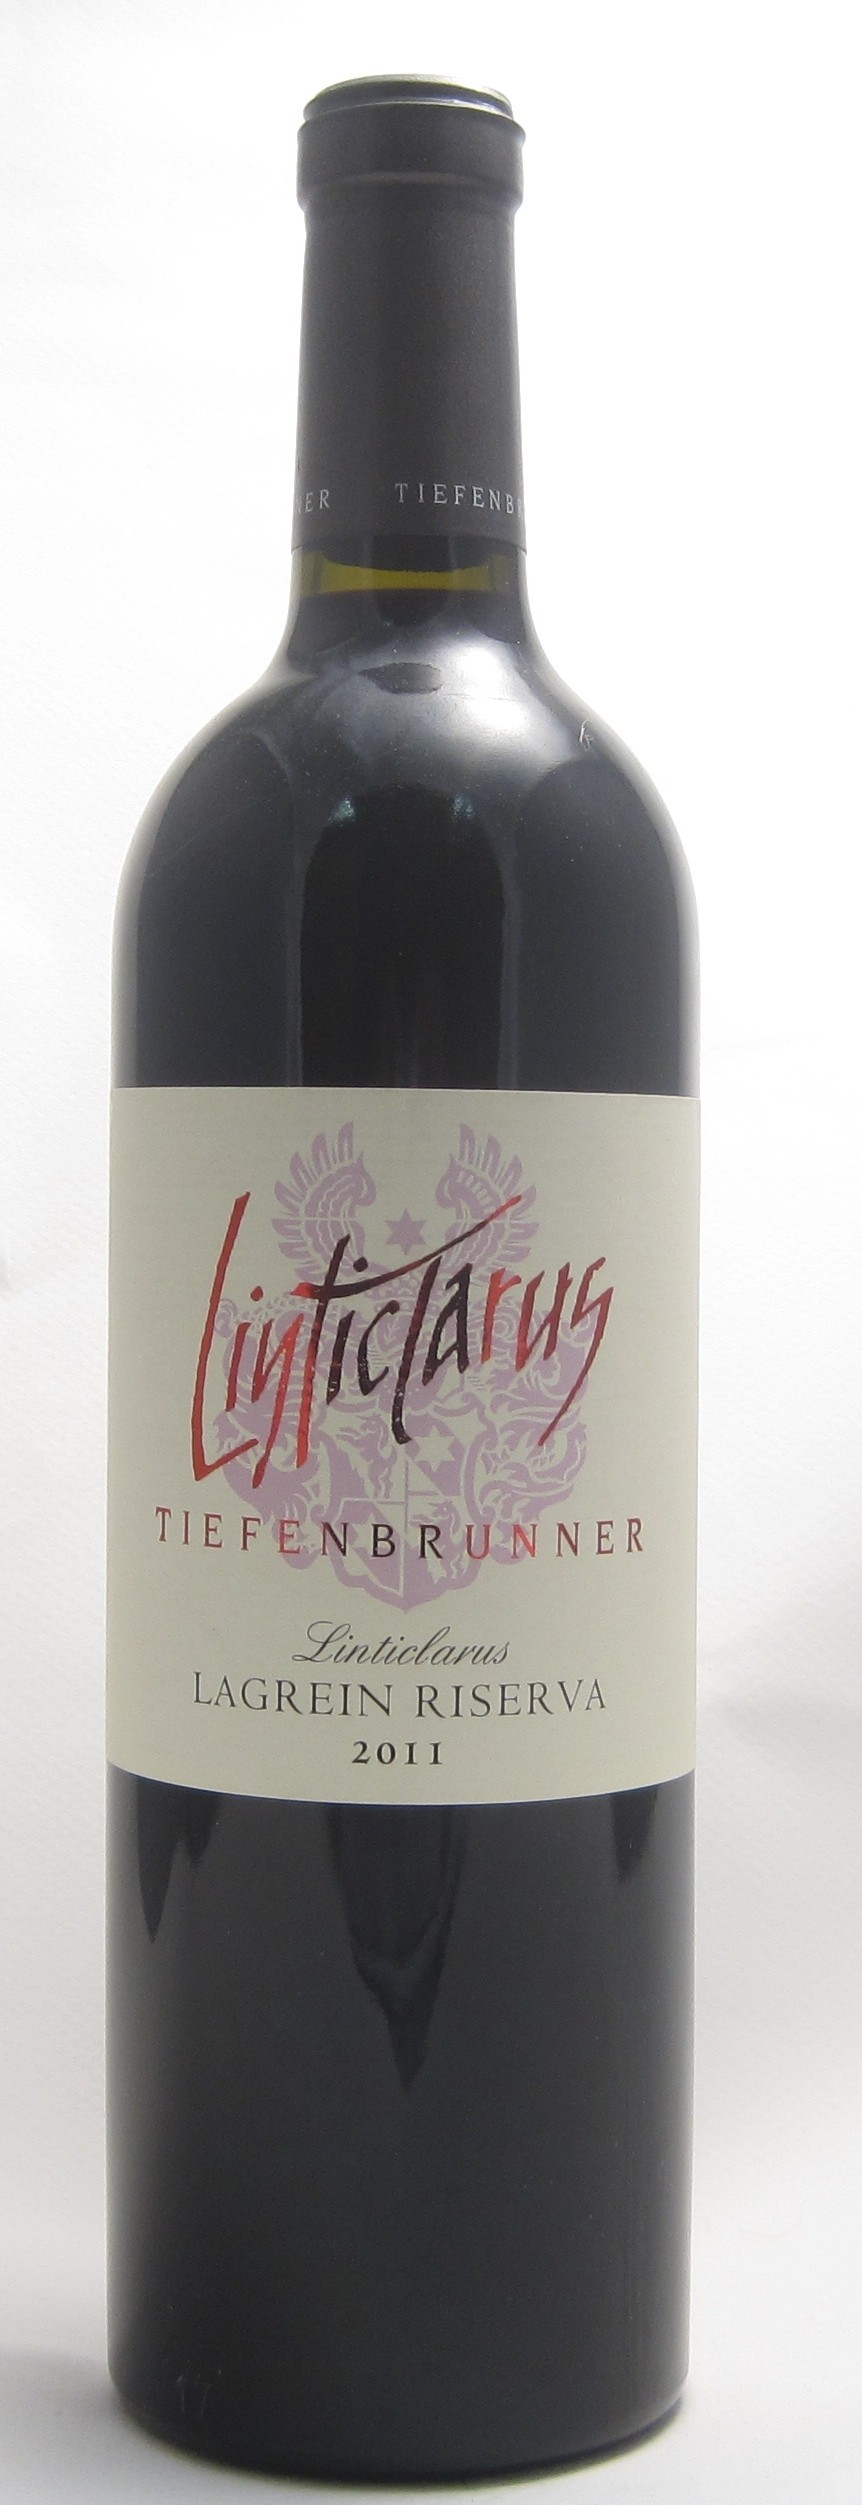 Tiefenbrunner 'Linticlarus' Lagrein Riserva